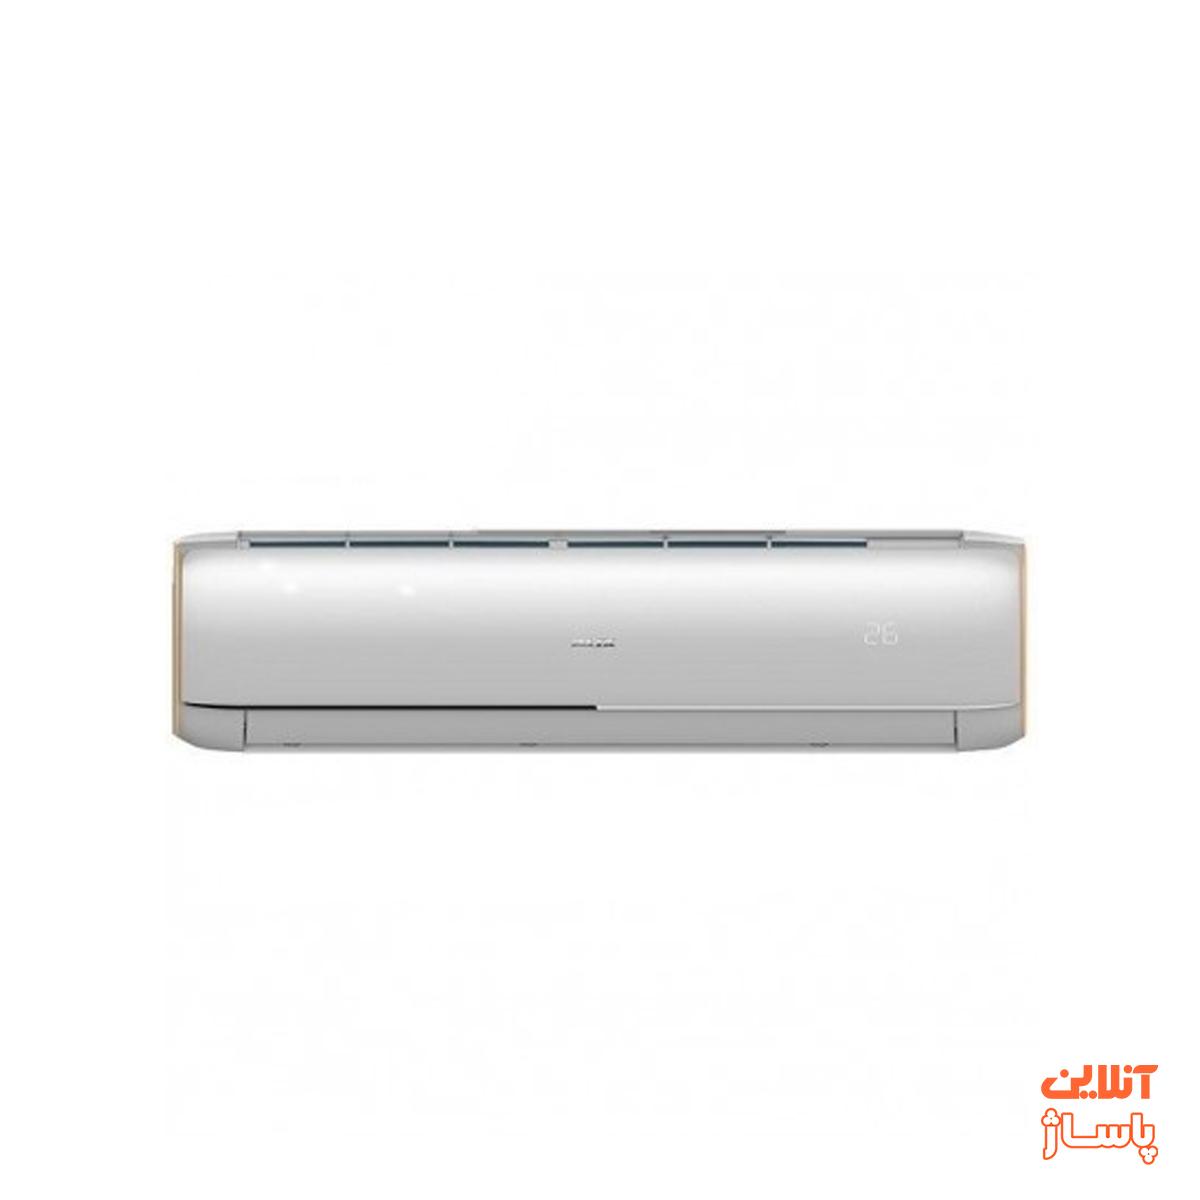 کولر گازی سرد و گرم اینورتر آکس مدل ZT109A4/D1